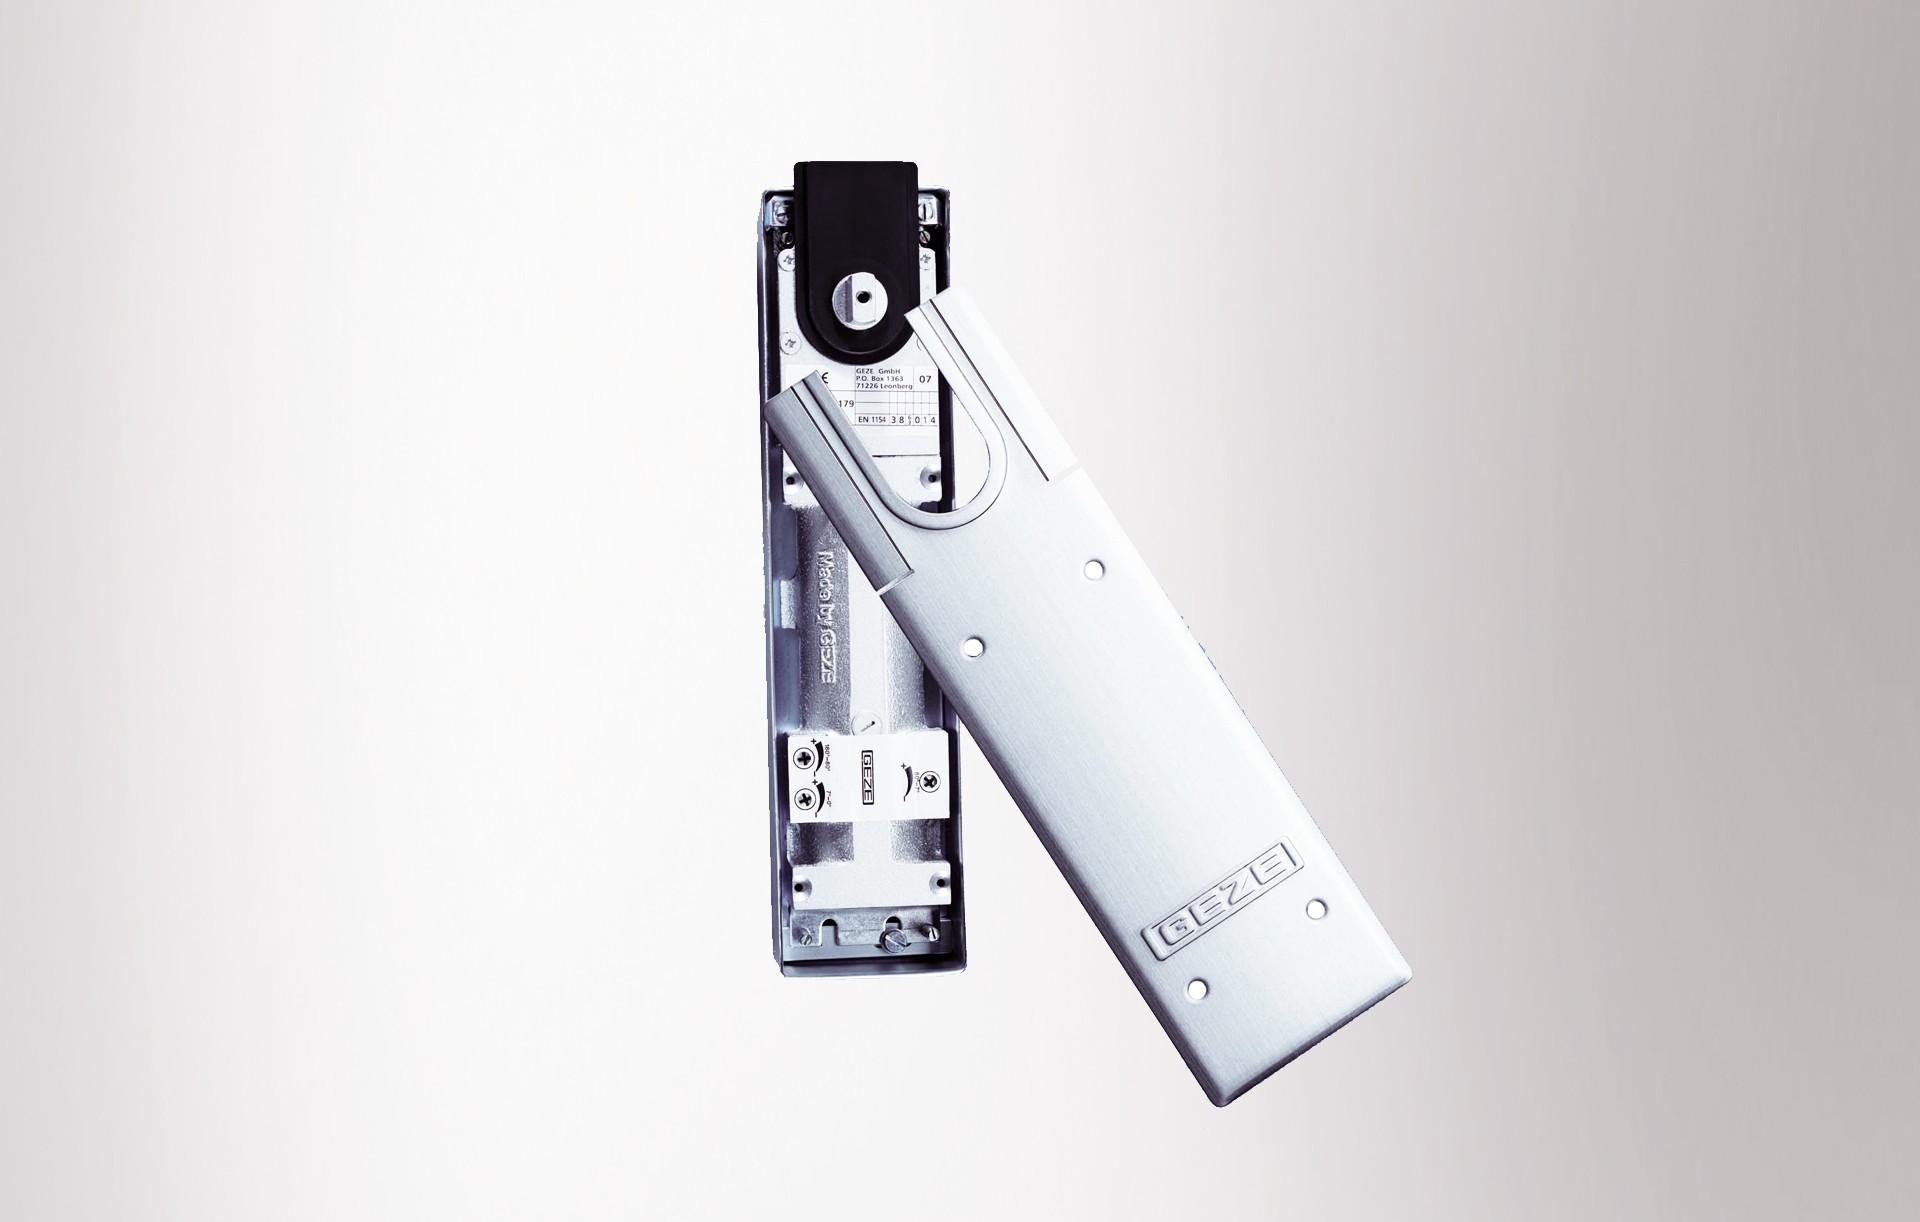 TS 550 NV